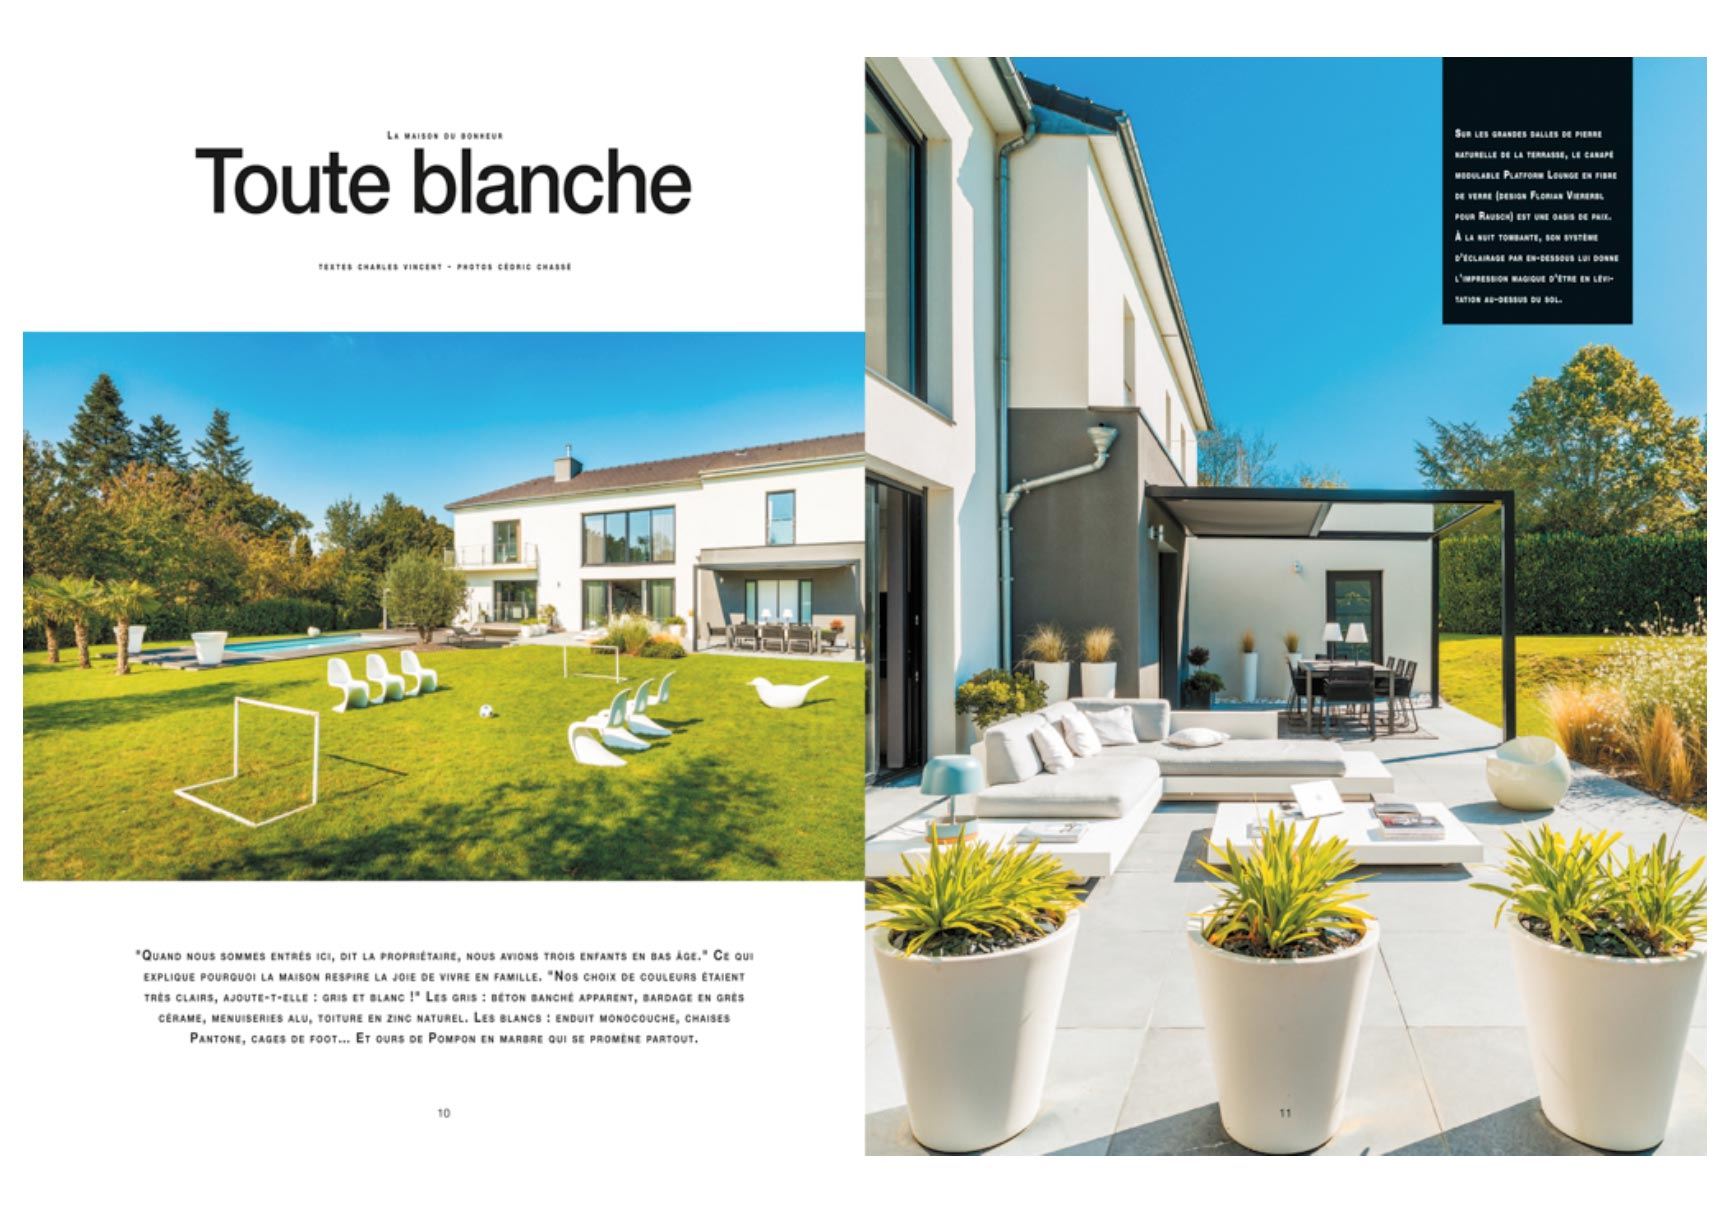 caroline desert magazine habitat caroline desert. Black Bedroom Furniture Sets. Home Design Ideas